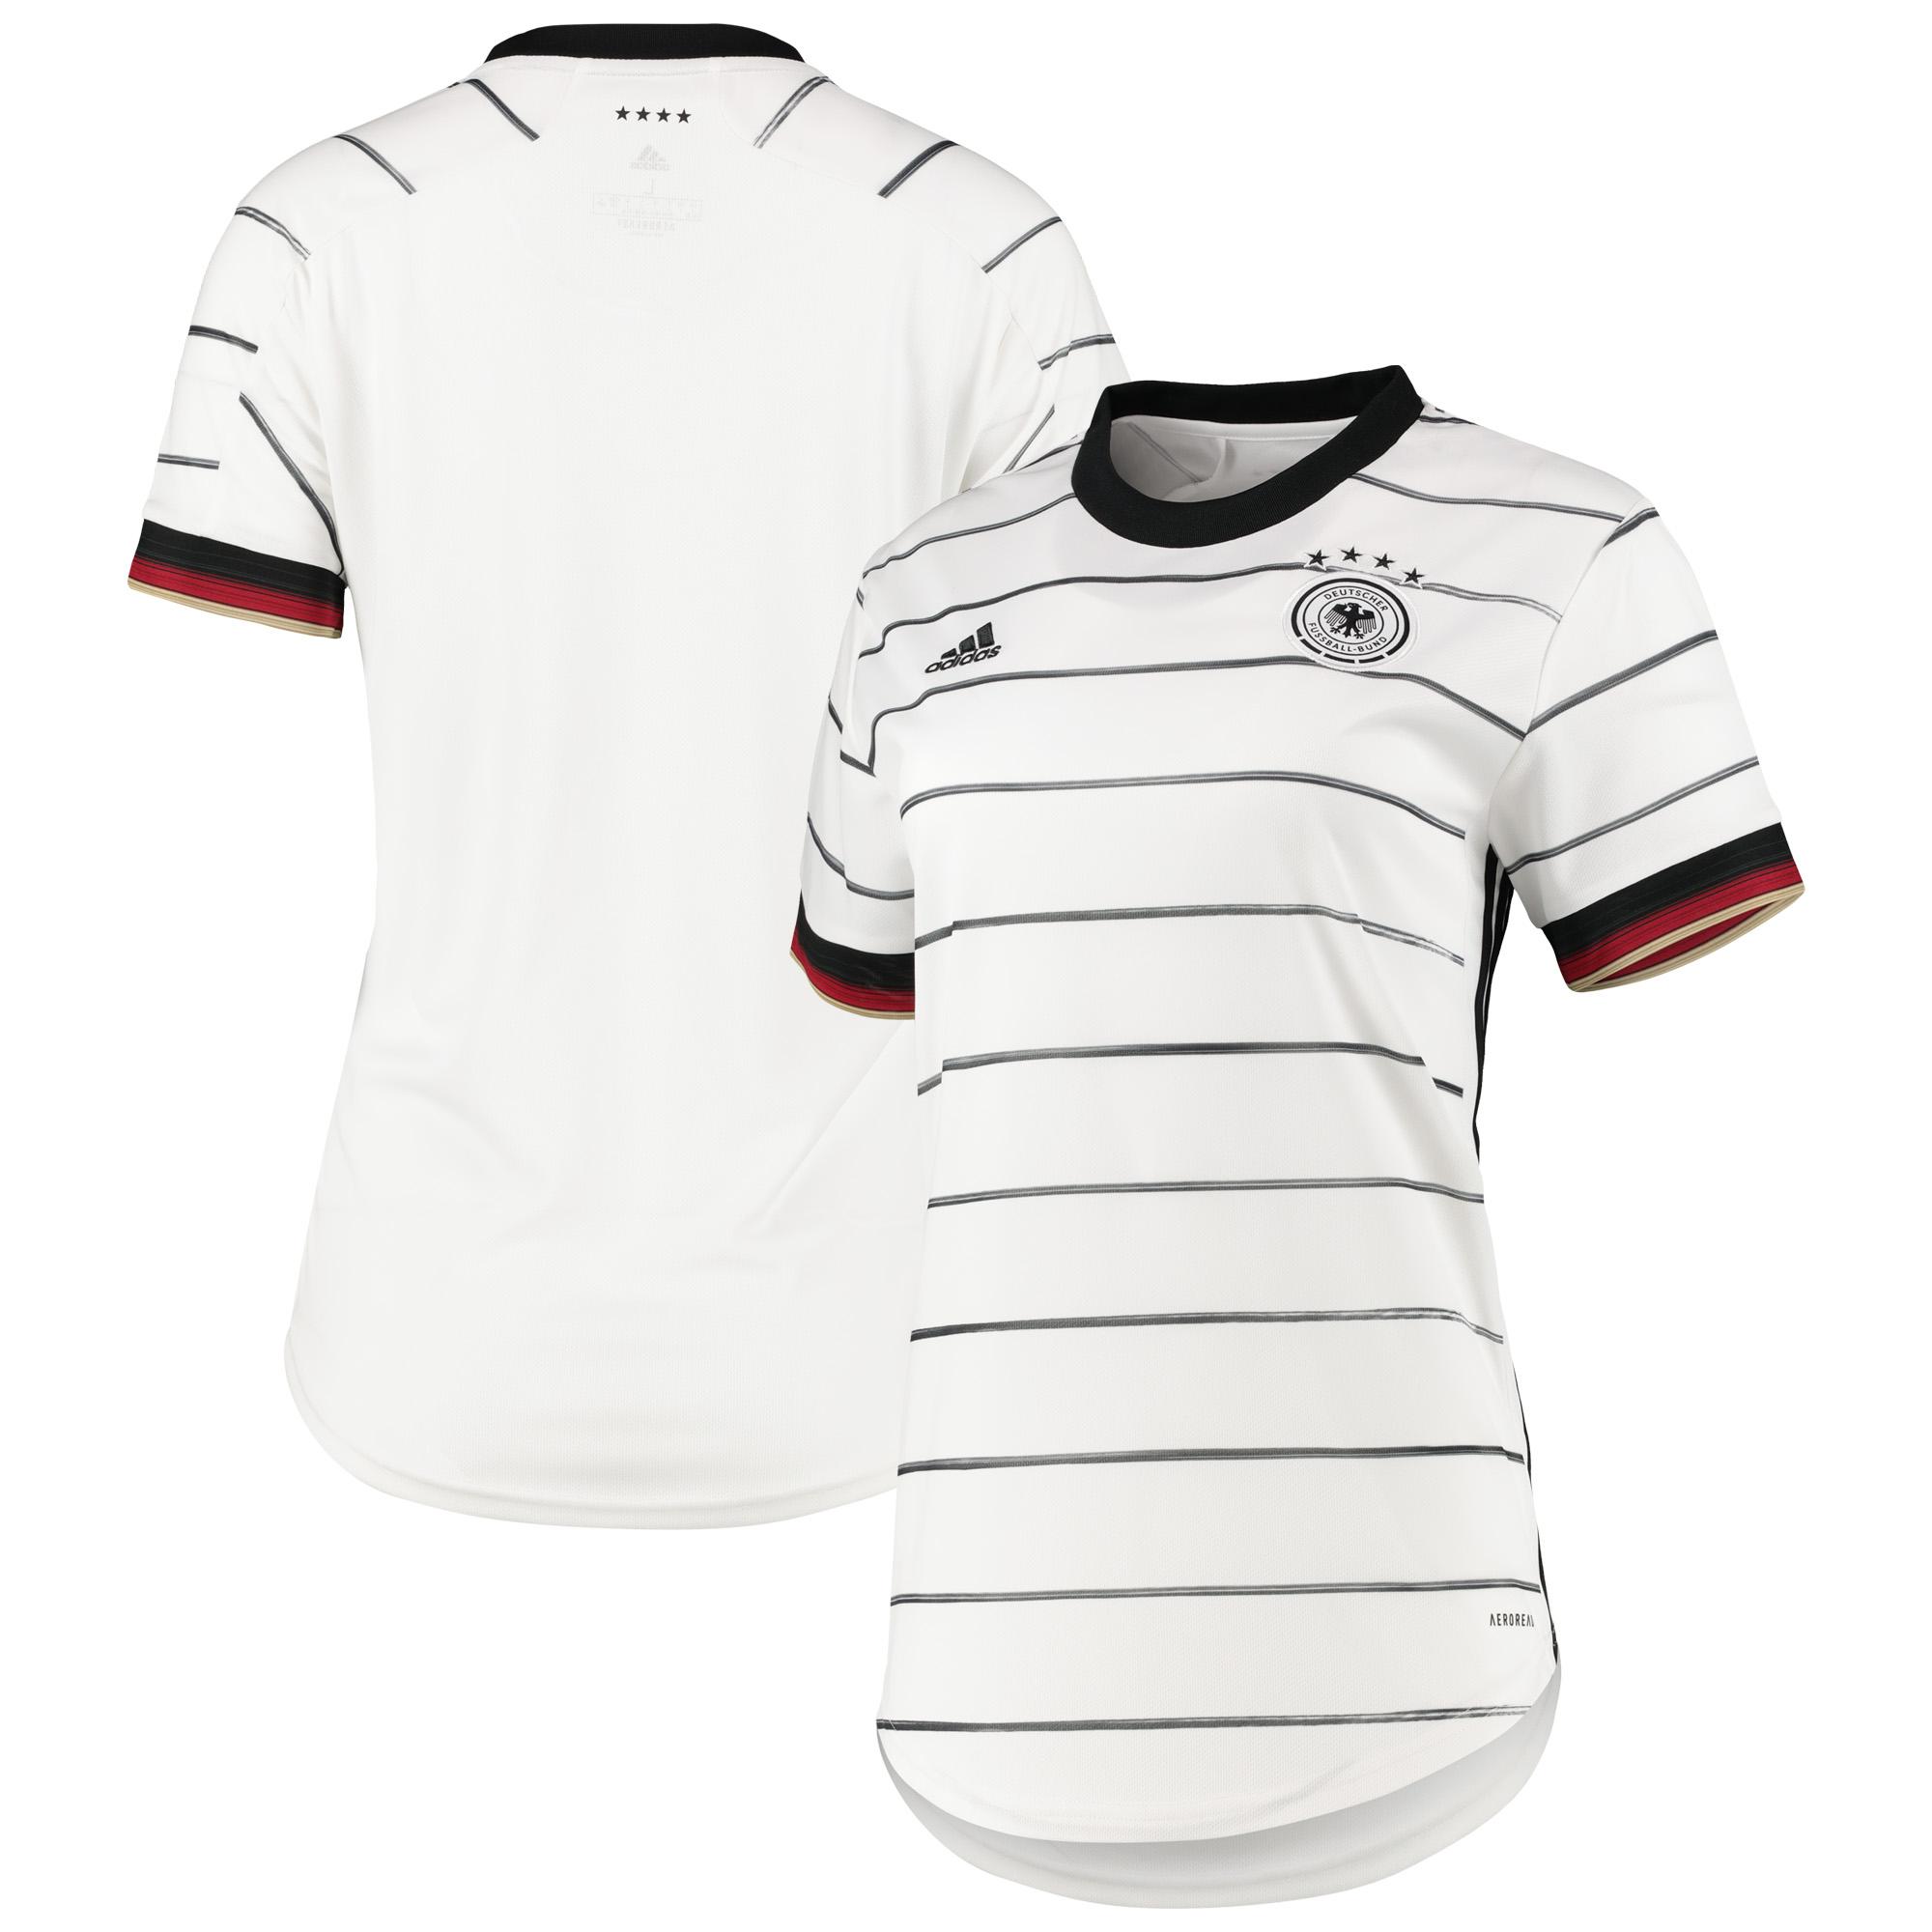 Germany Home Shirt 2019-21 - Womens